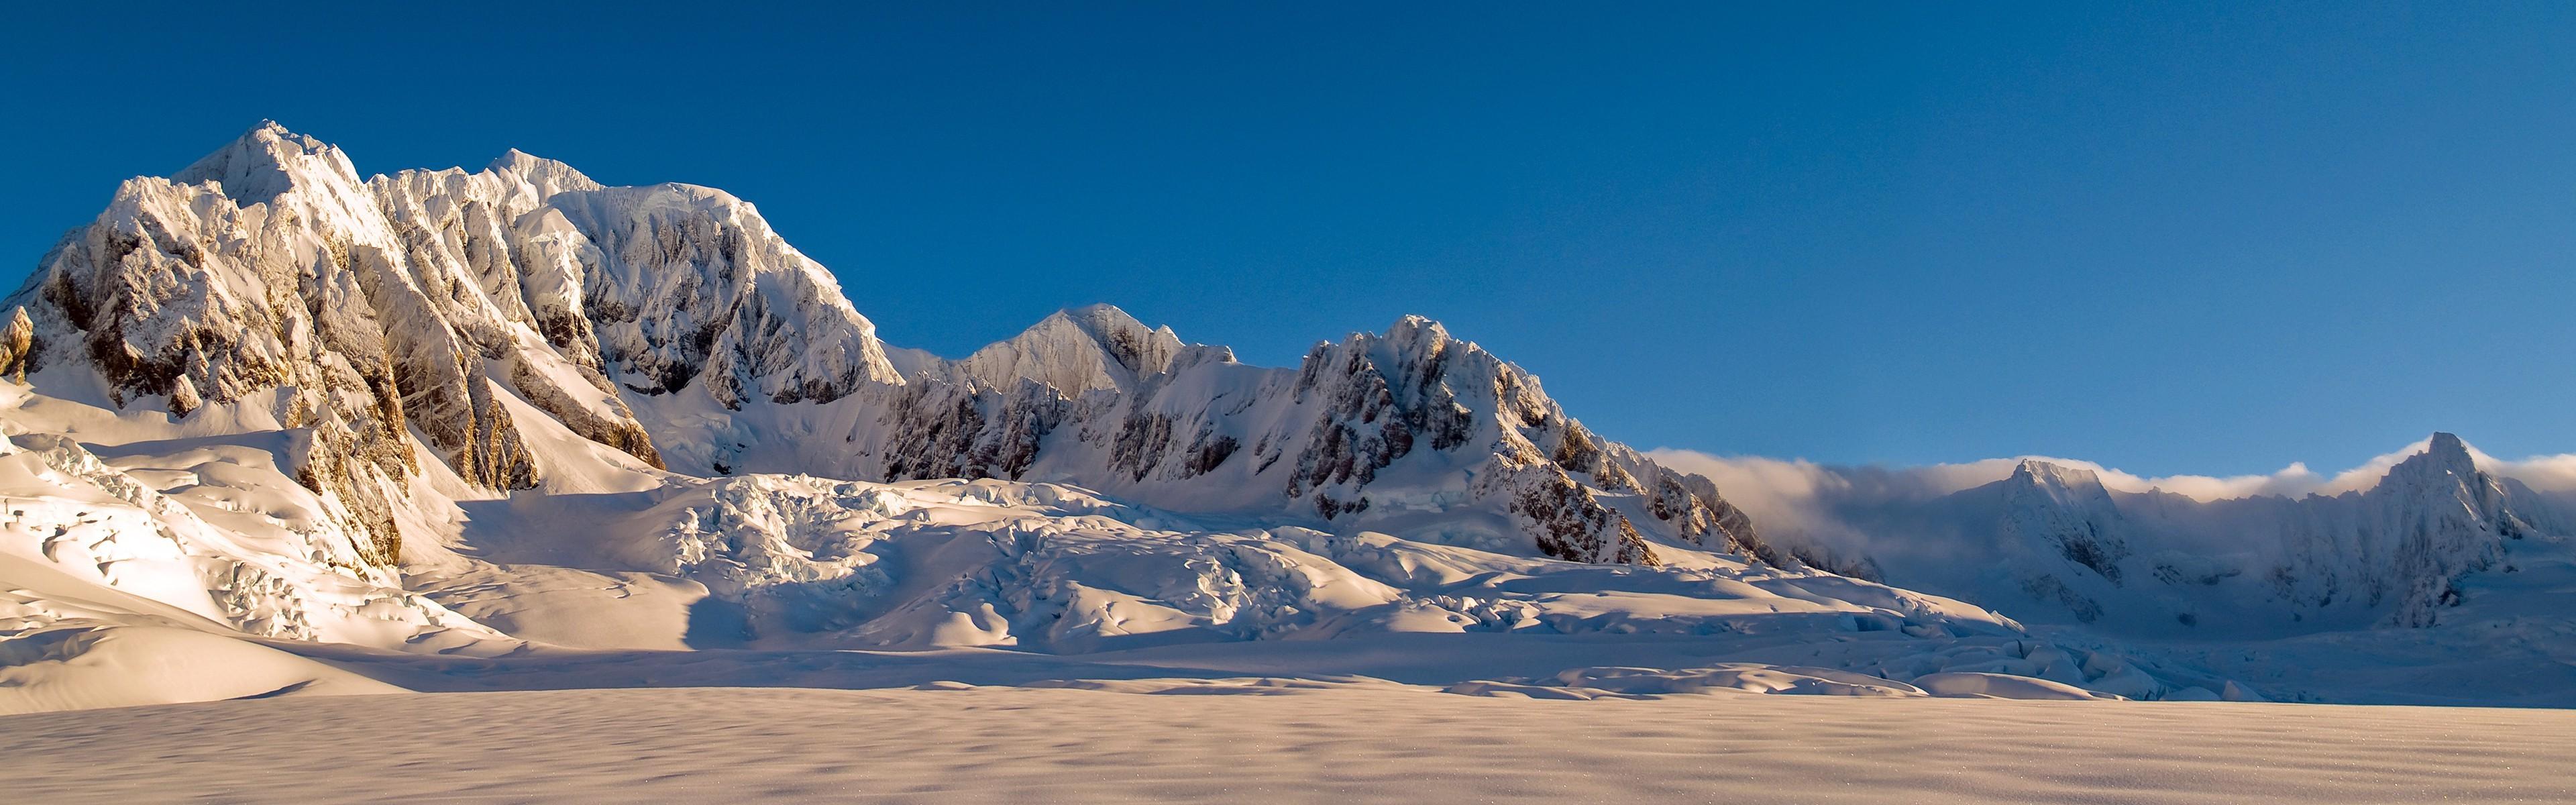 Top Wallpaper Mountain Dual Screen - landscape-snow-winter-ice-dual-monitors-multiple-display-Alps-summit-plateau-mountain-weather-season-piste-3840x1200-px-mountainous-landforms-landform-geographical-feature-geological-phenomenon-mountain-range-winter-sport-632596  Photograph_95943.jpg